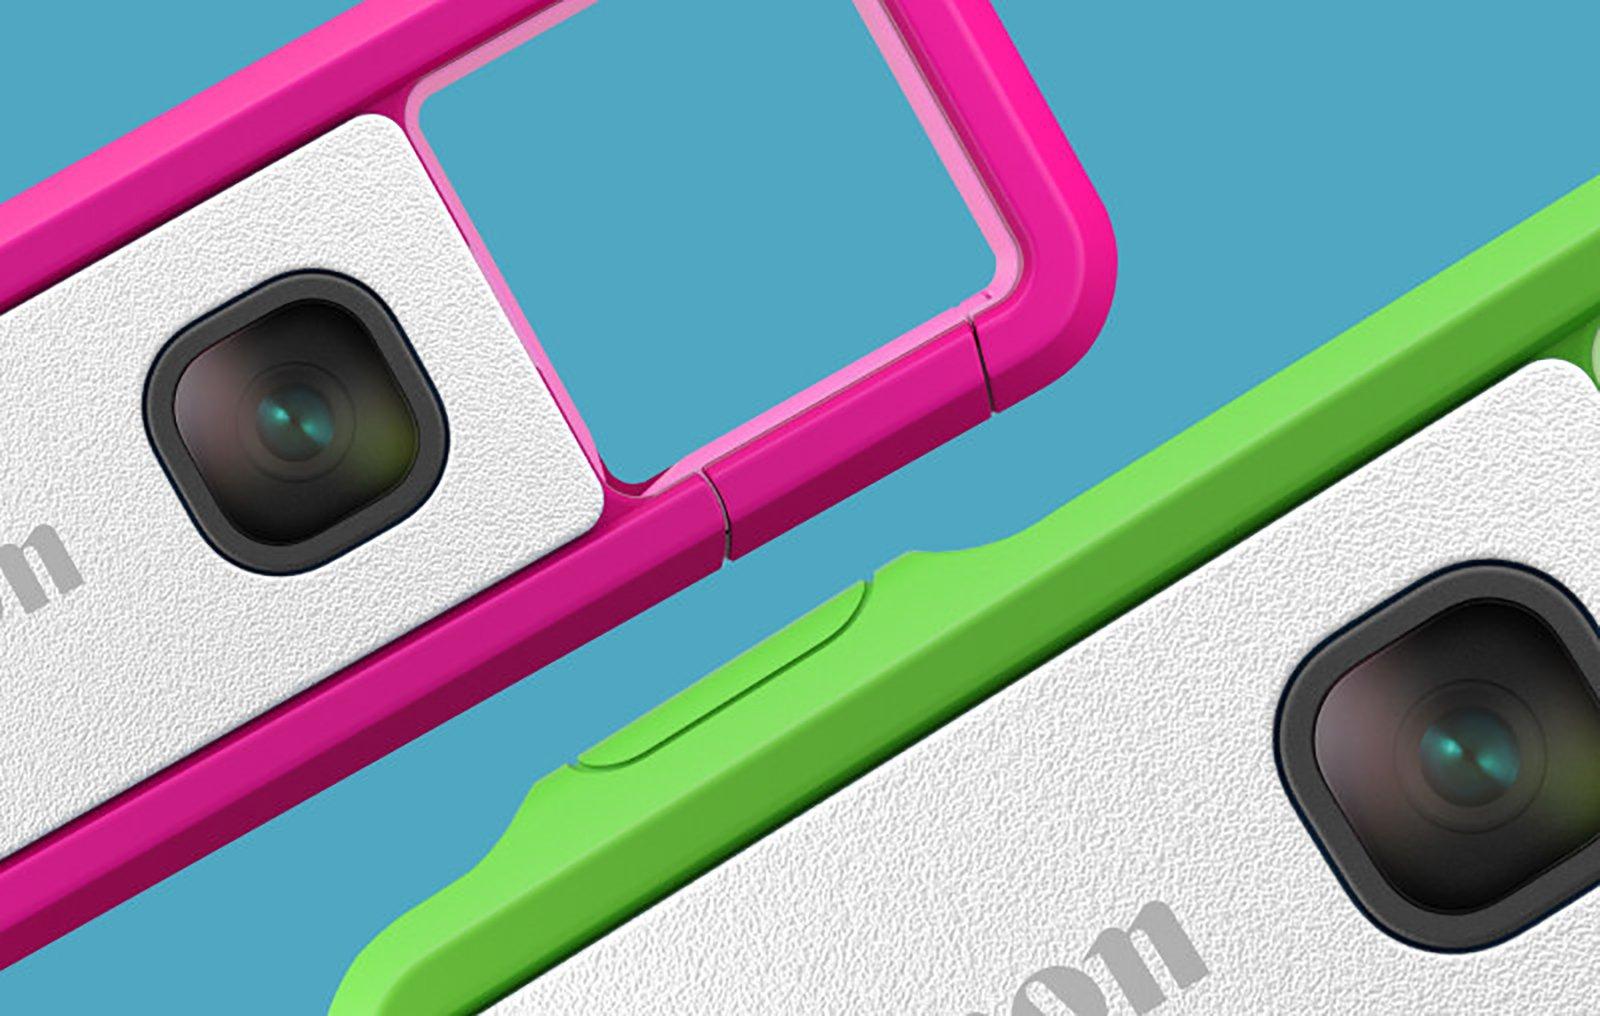 Canon is Crowdfunding a 'Clippable' Camera Through Indiegogo